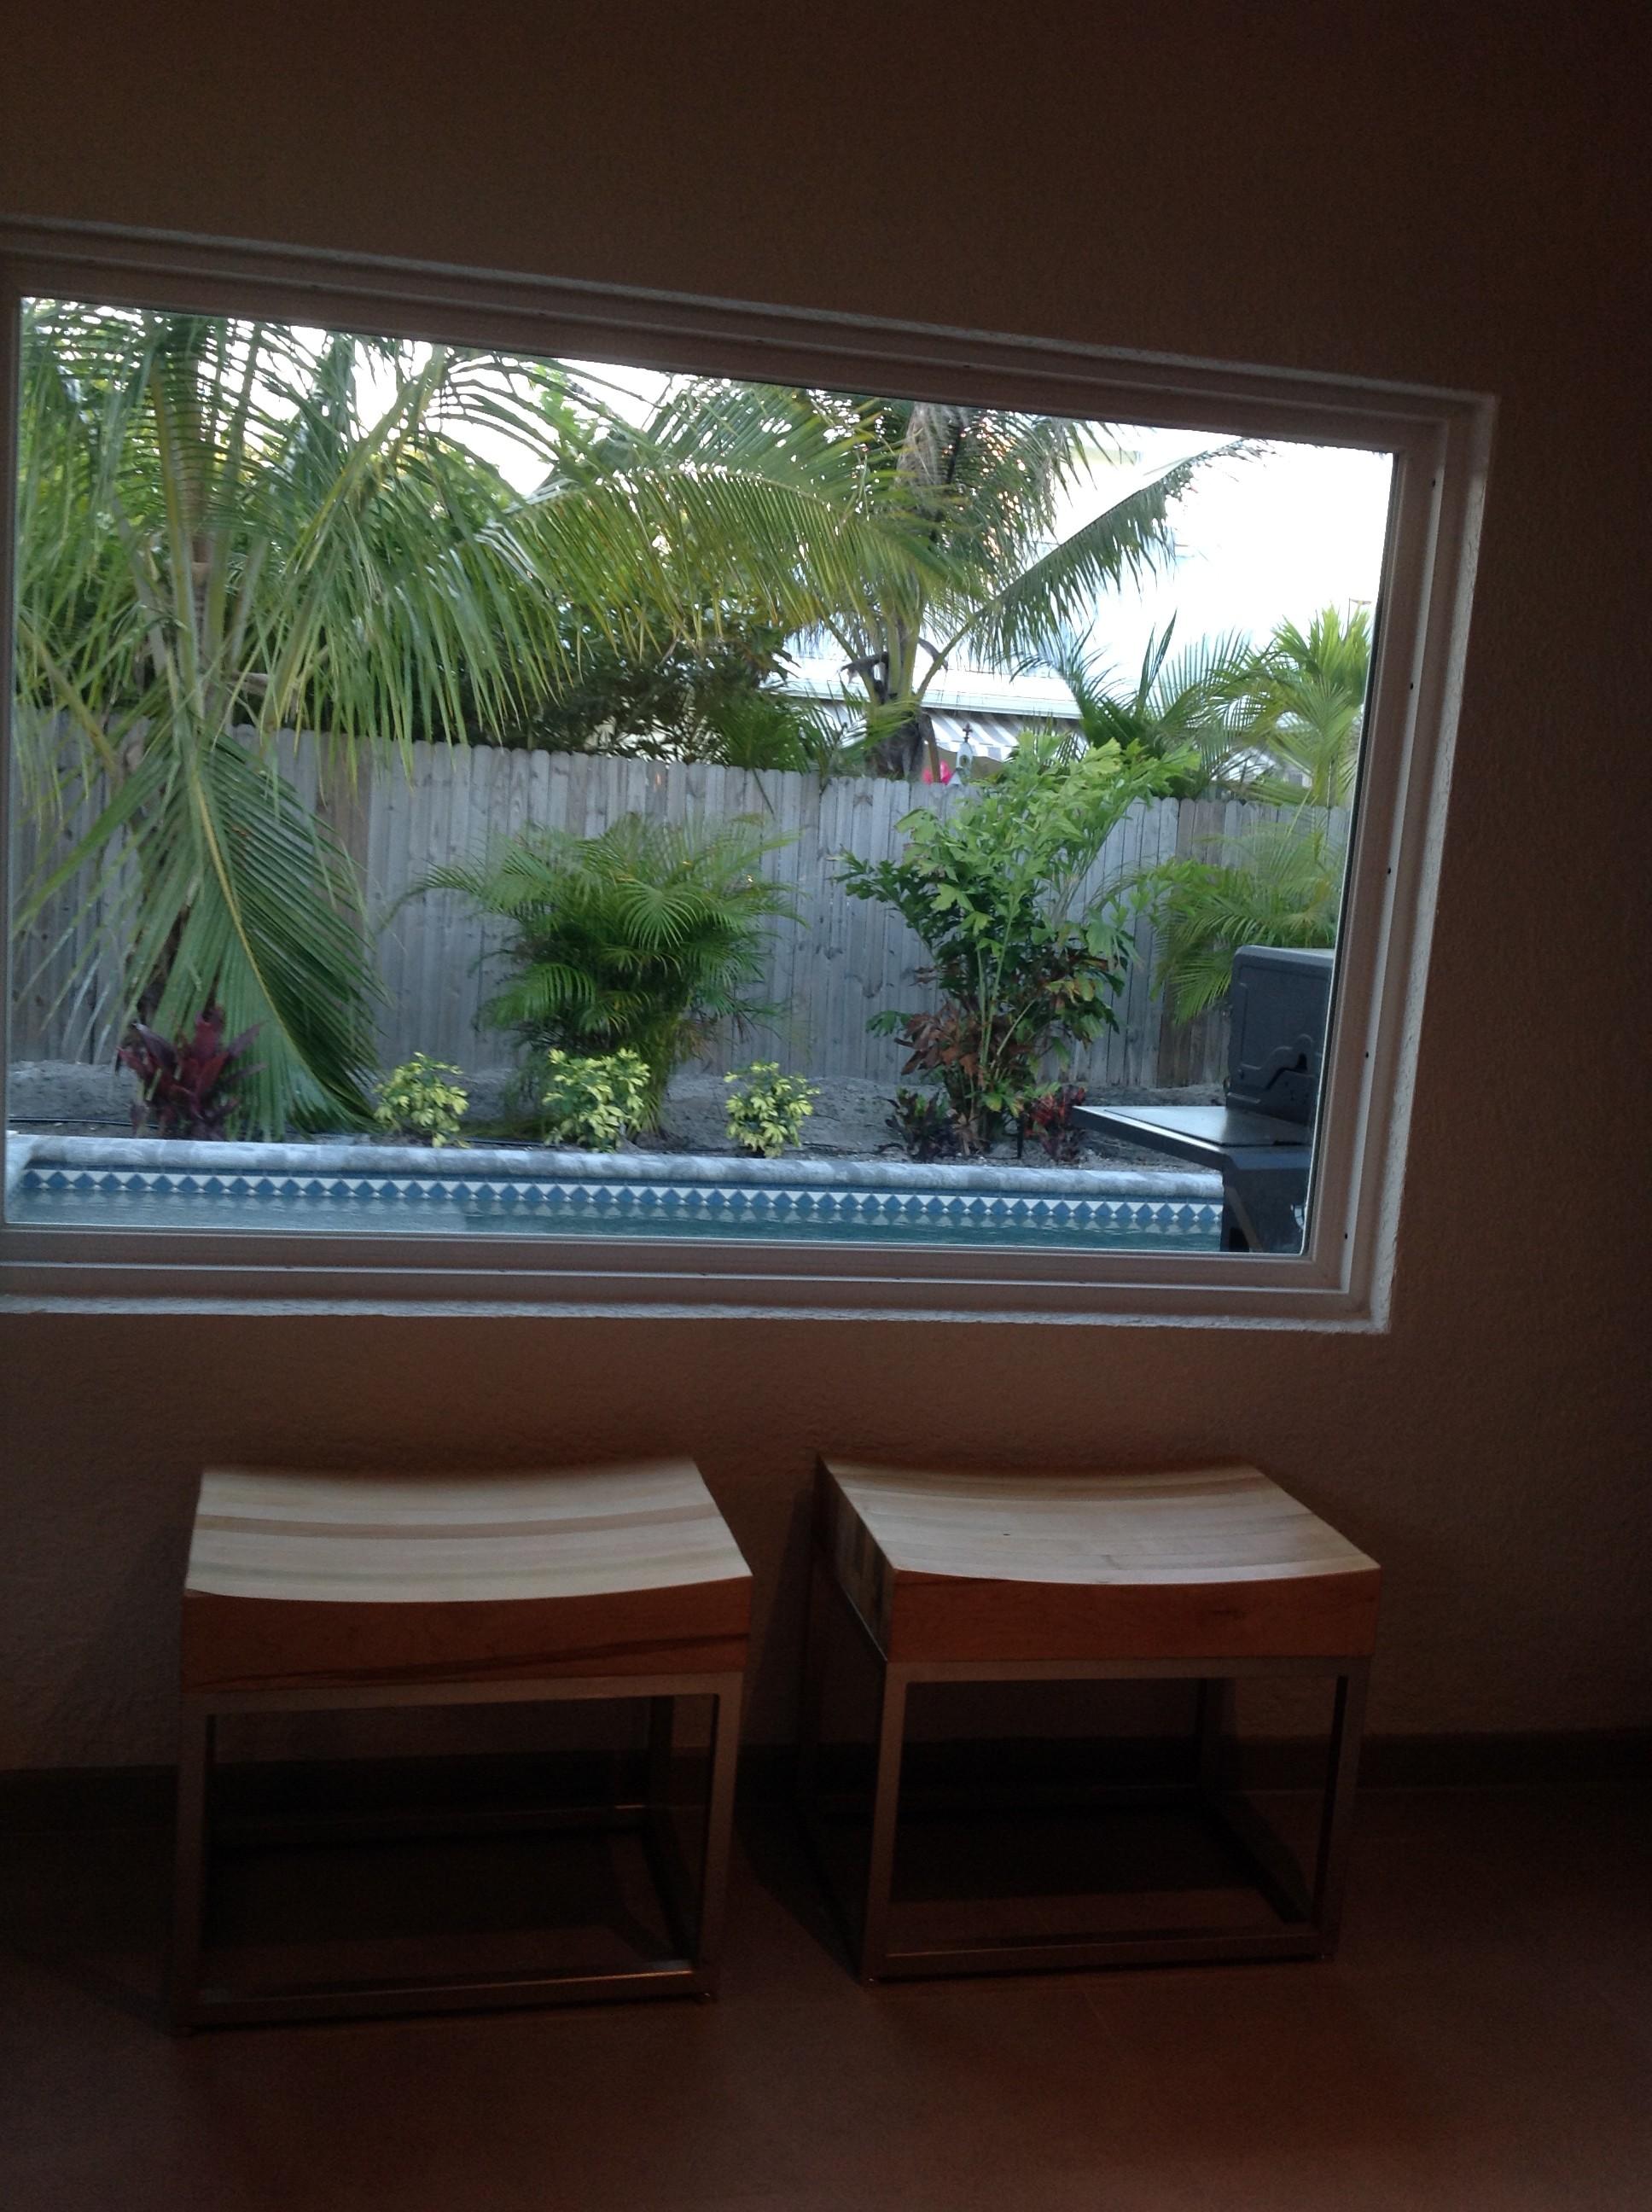 New pool window